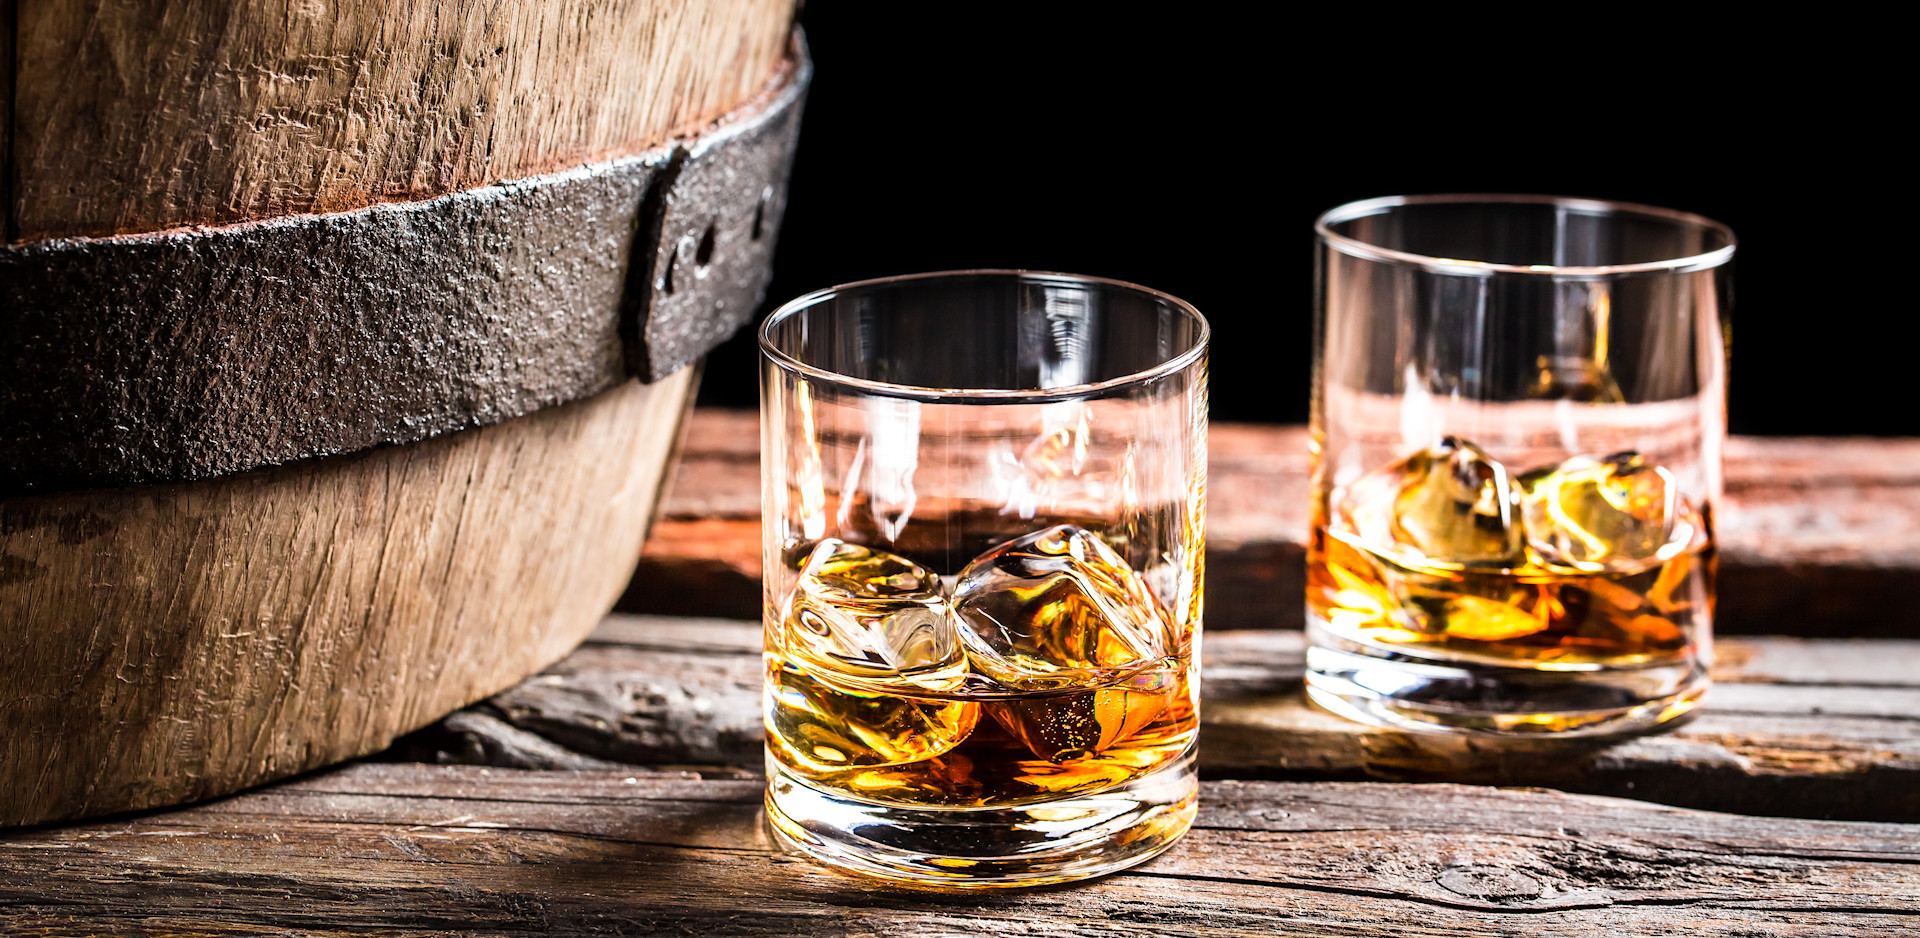 Bourbon glasses sitting next to a bourbon barrel